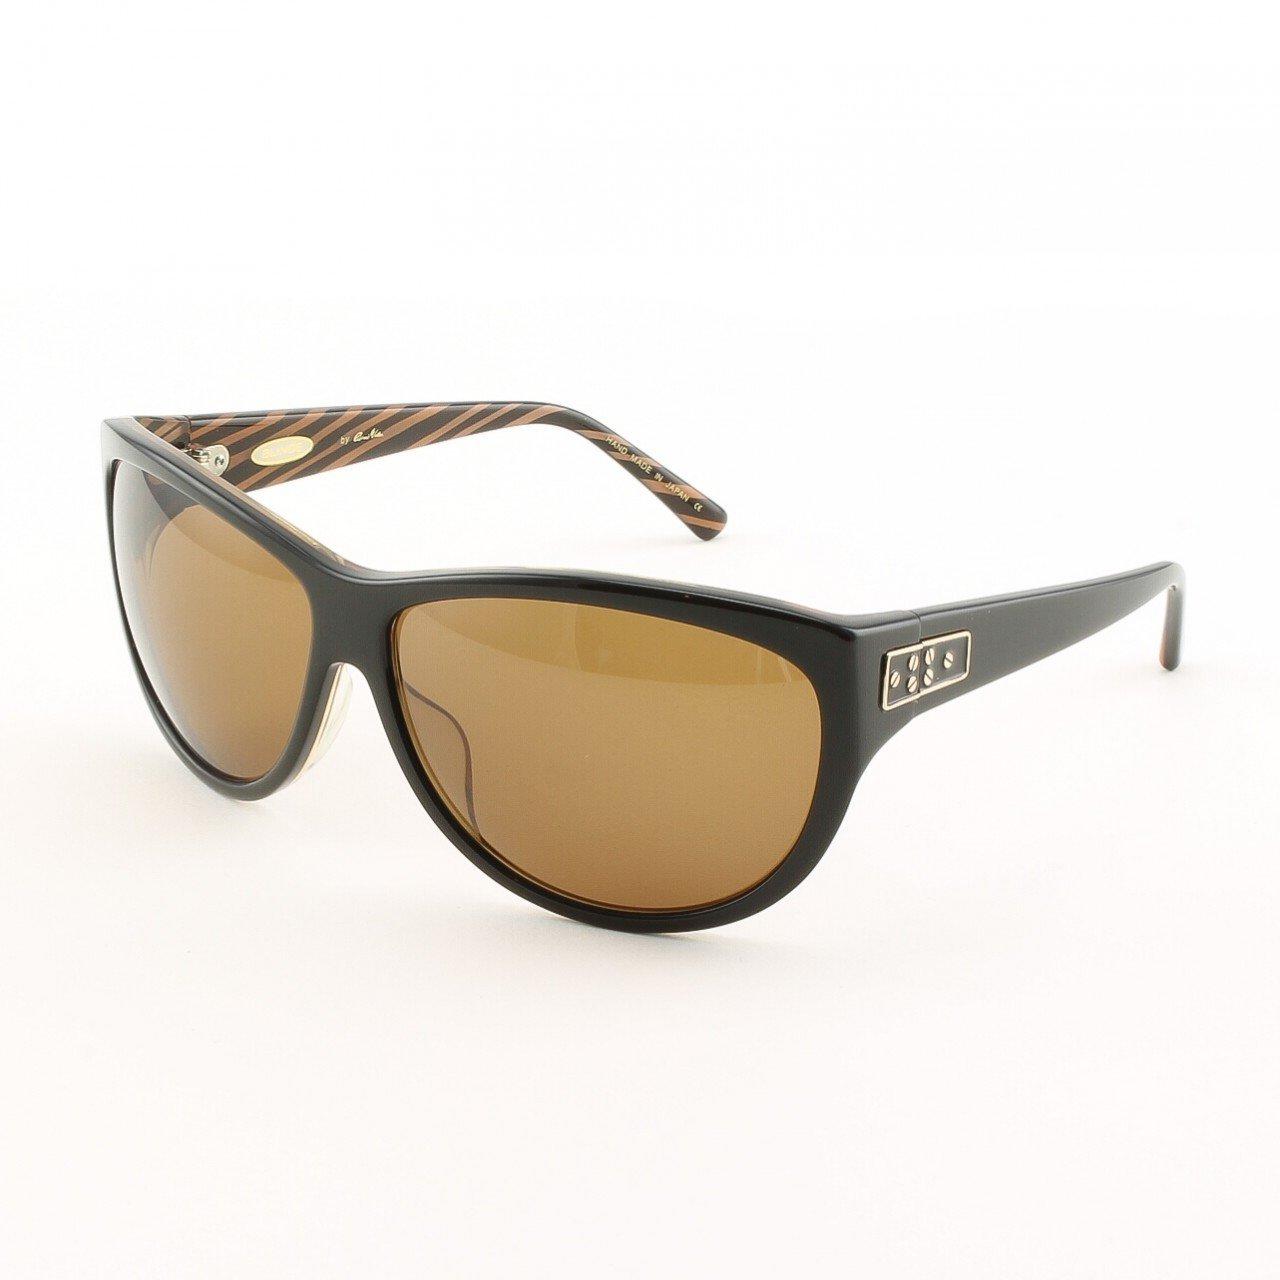 Blinde Lips Like Sugar Women's Sunglasses Col. Brown Zebra with Brown Gradient Lenses